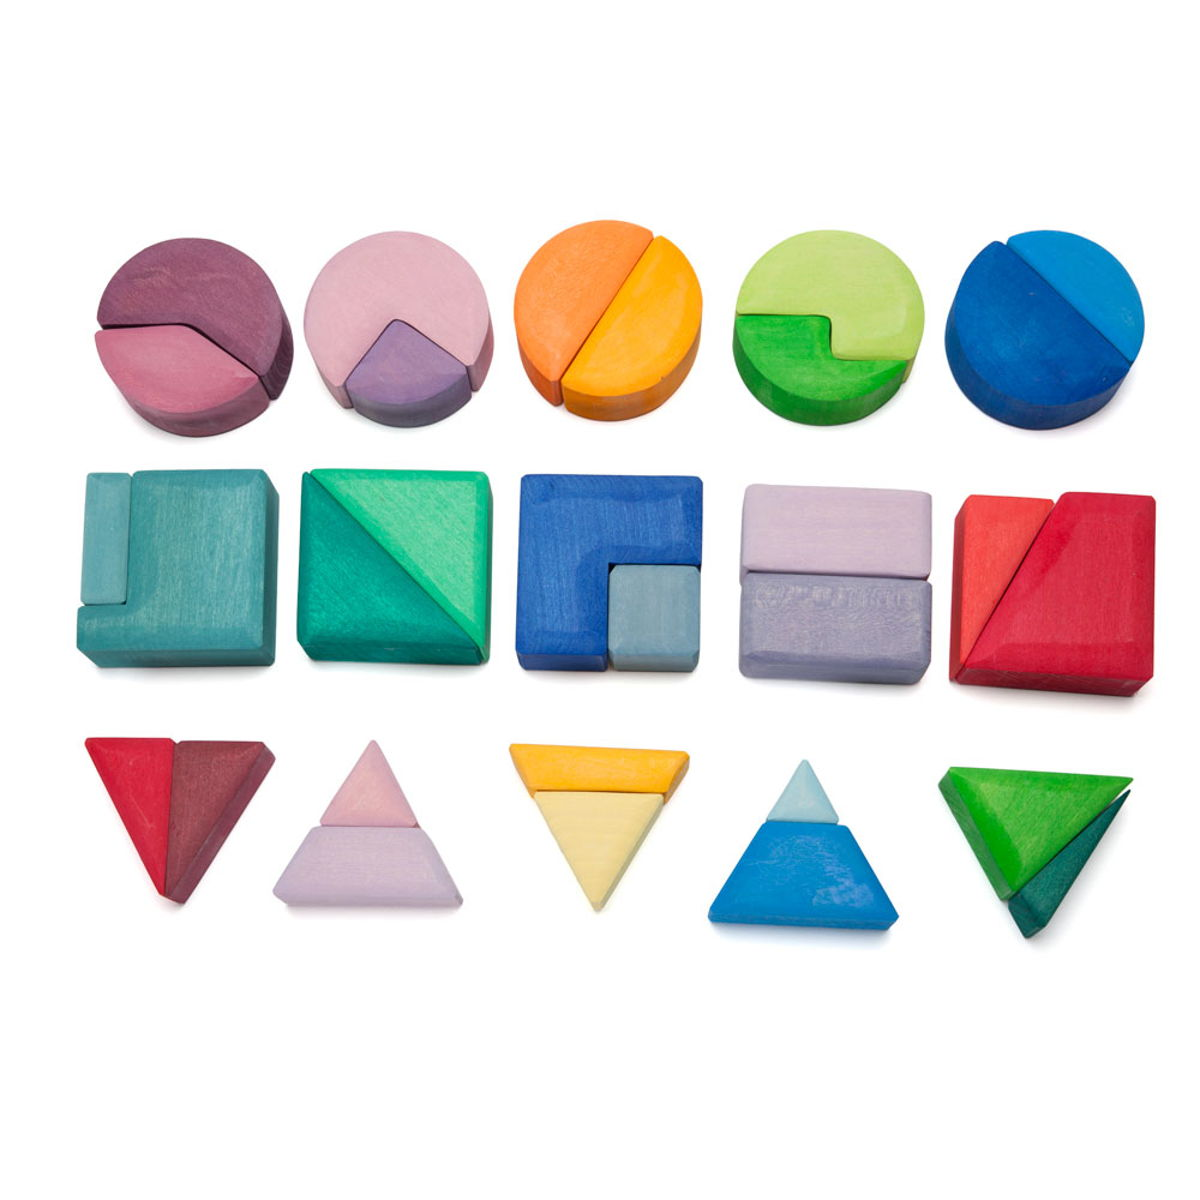 triangles, squares + circles